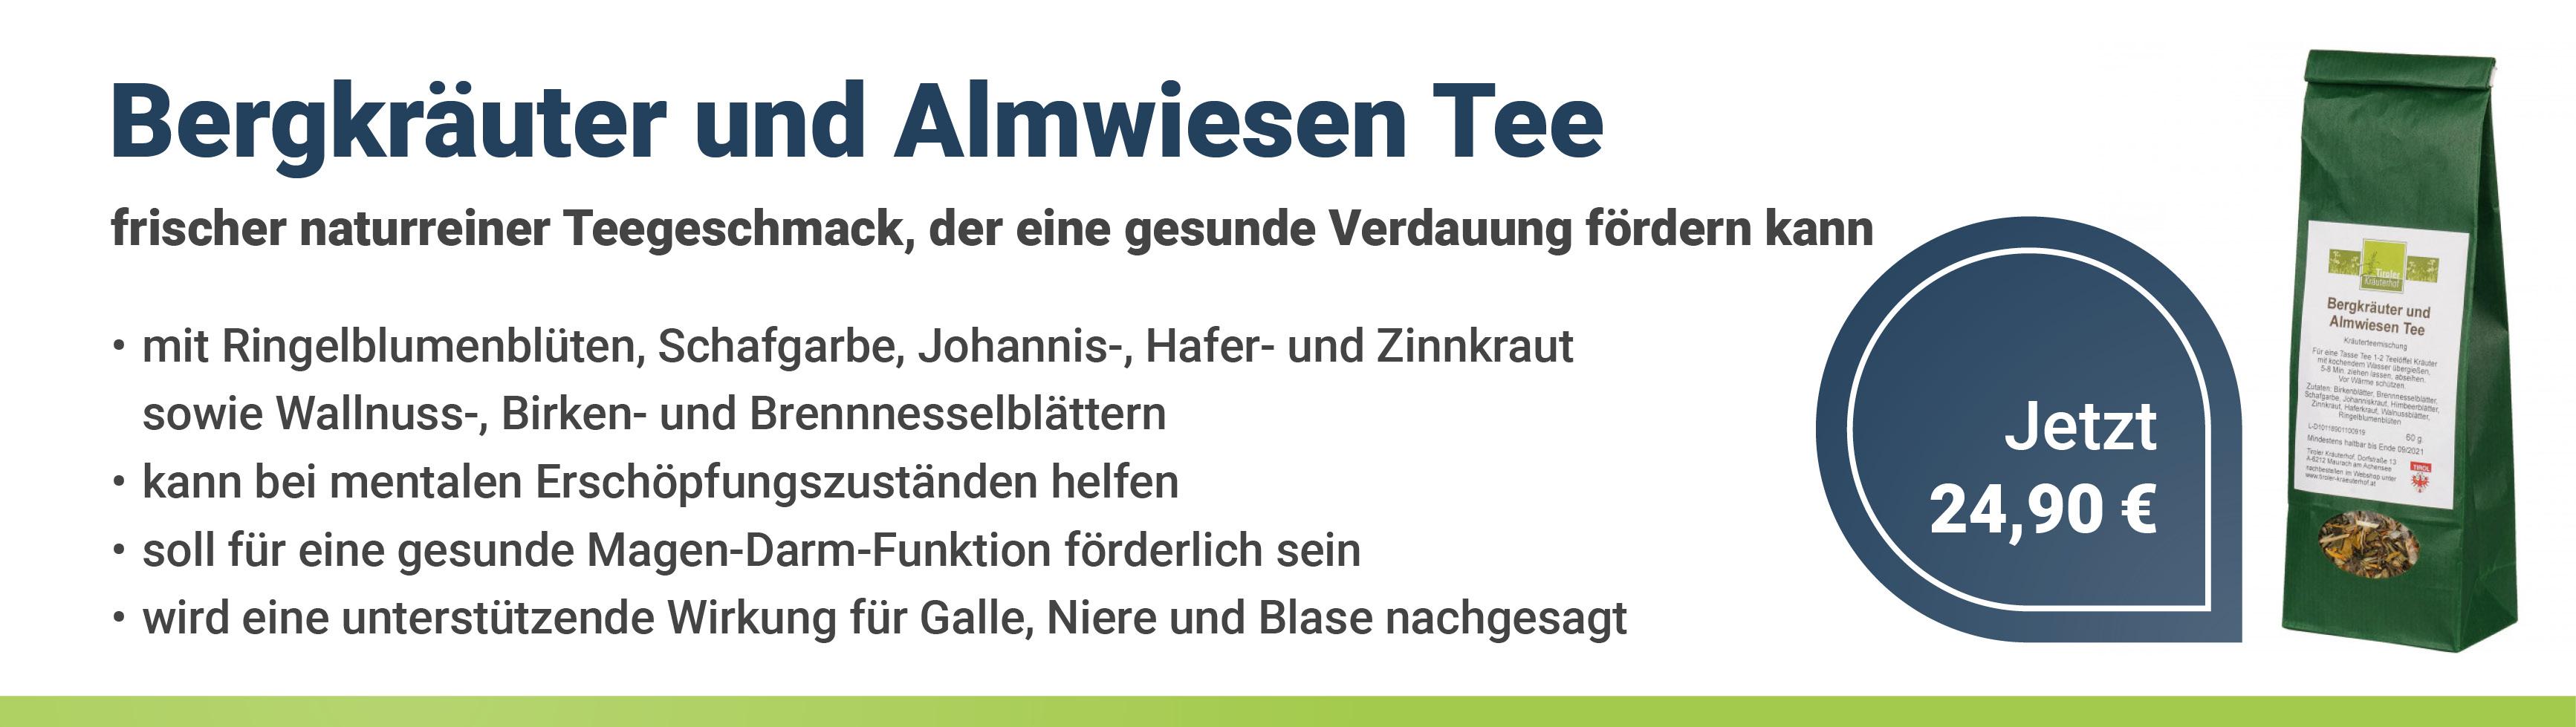 https://www.health-rise.de/wp-content/uploads/2021/10/Bergkraeuter-und-Almwiesen-Tee2.jpg